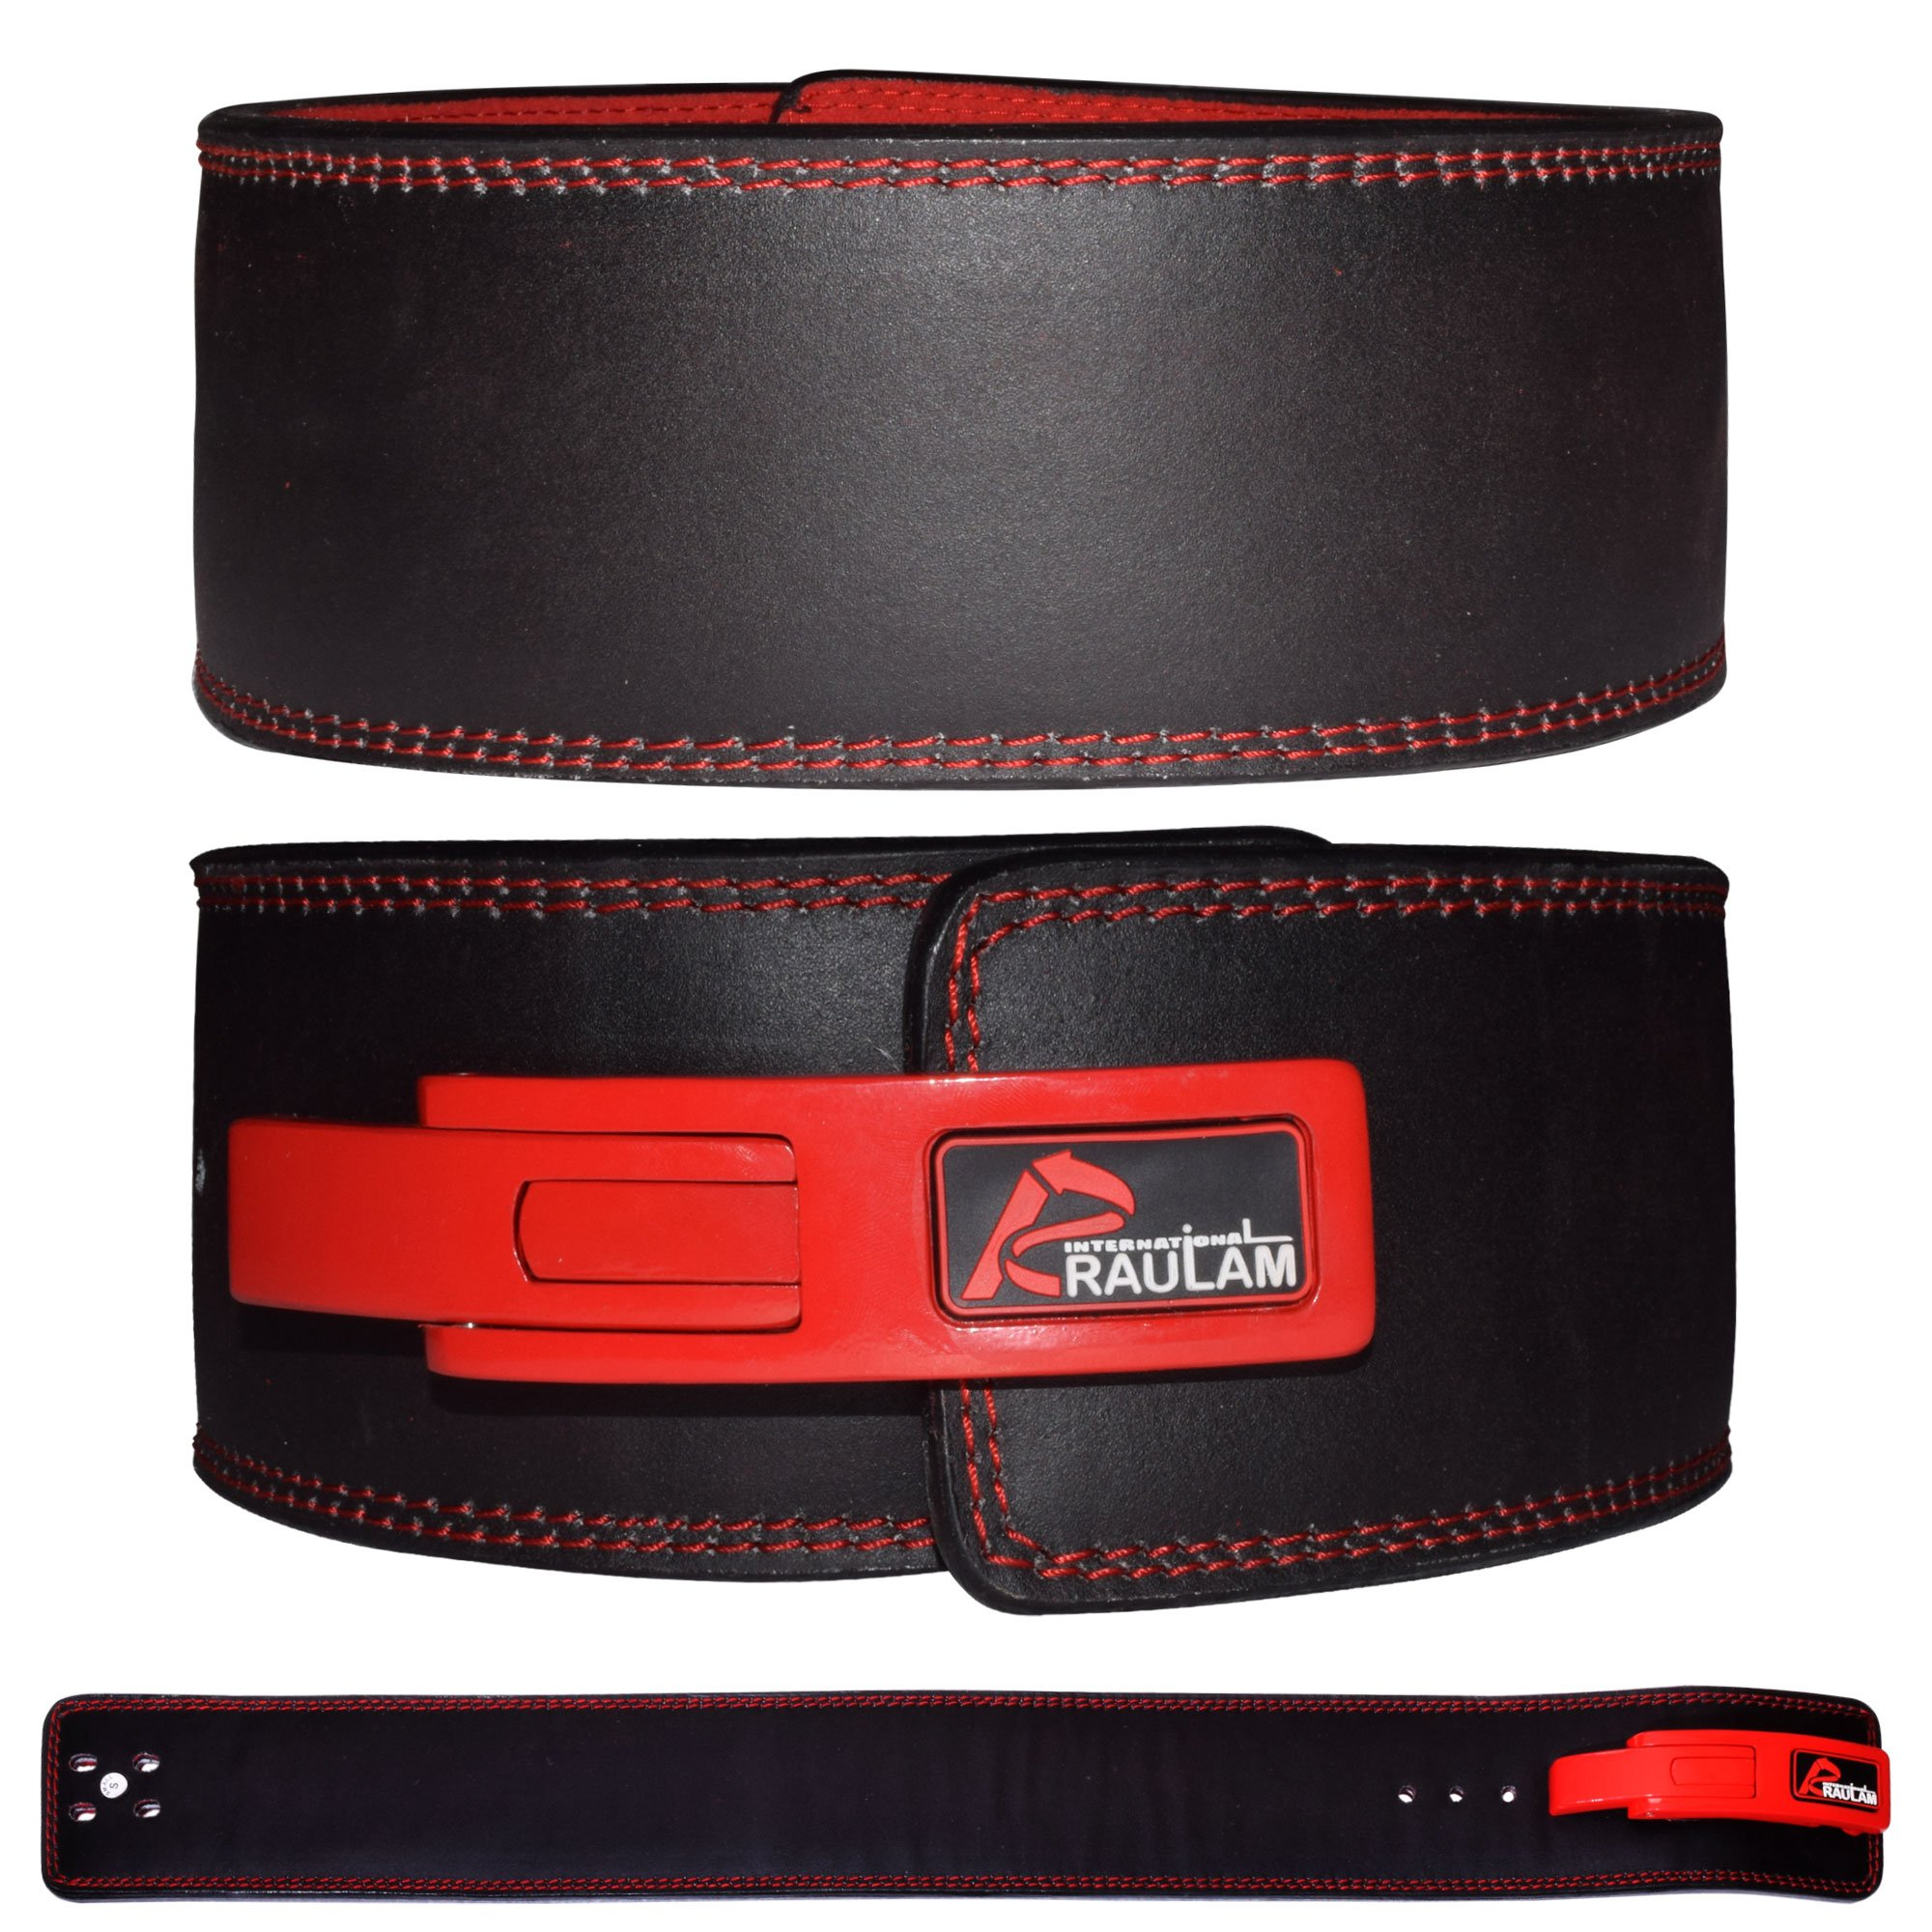 RAULAM INTERNATIONAL Lever Belt -Weight Lifting Lever Belt/Power Lifting Lever Belt/Buckle Belt (Black/Red, Small)